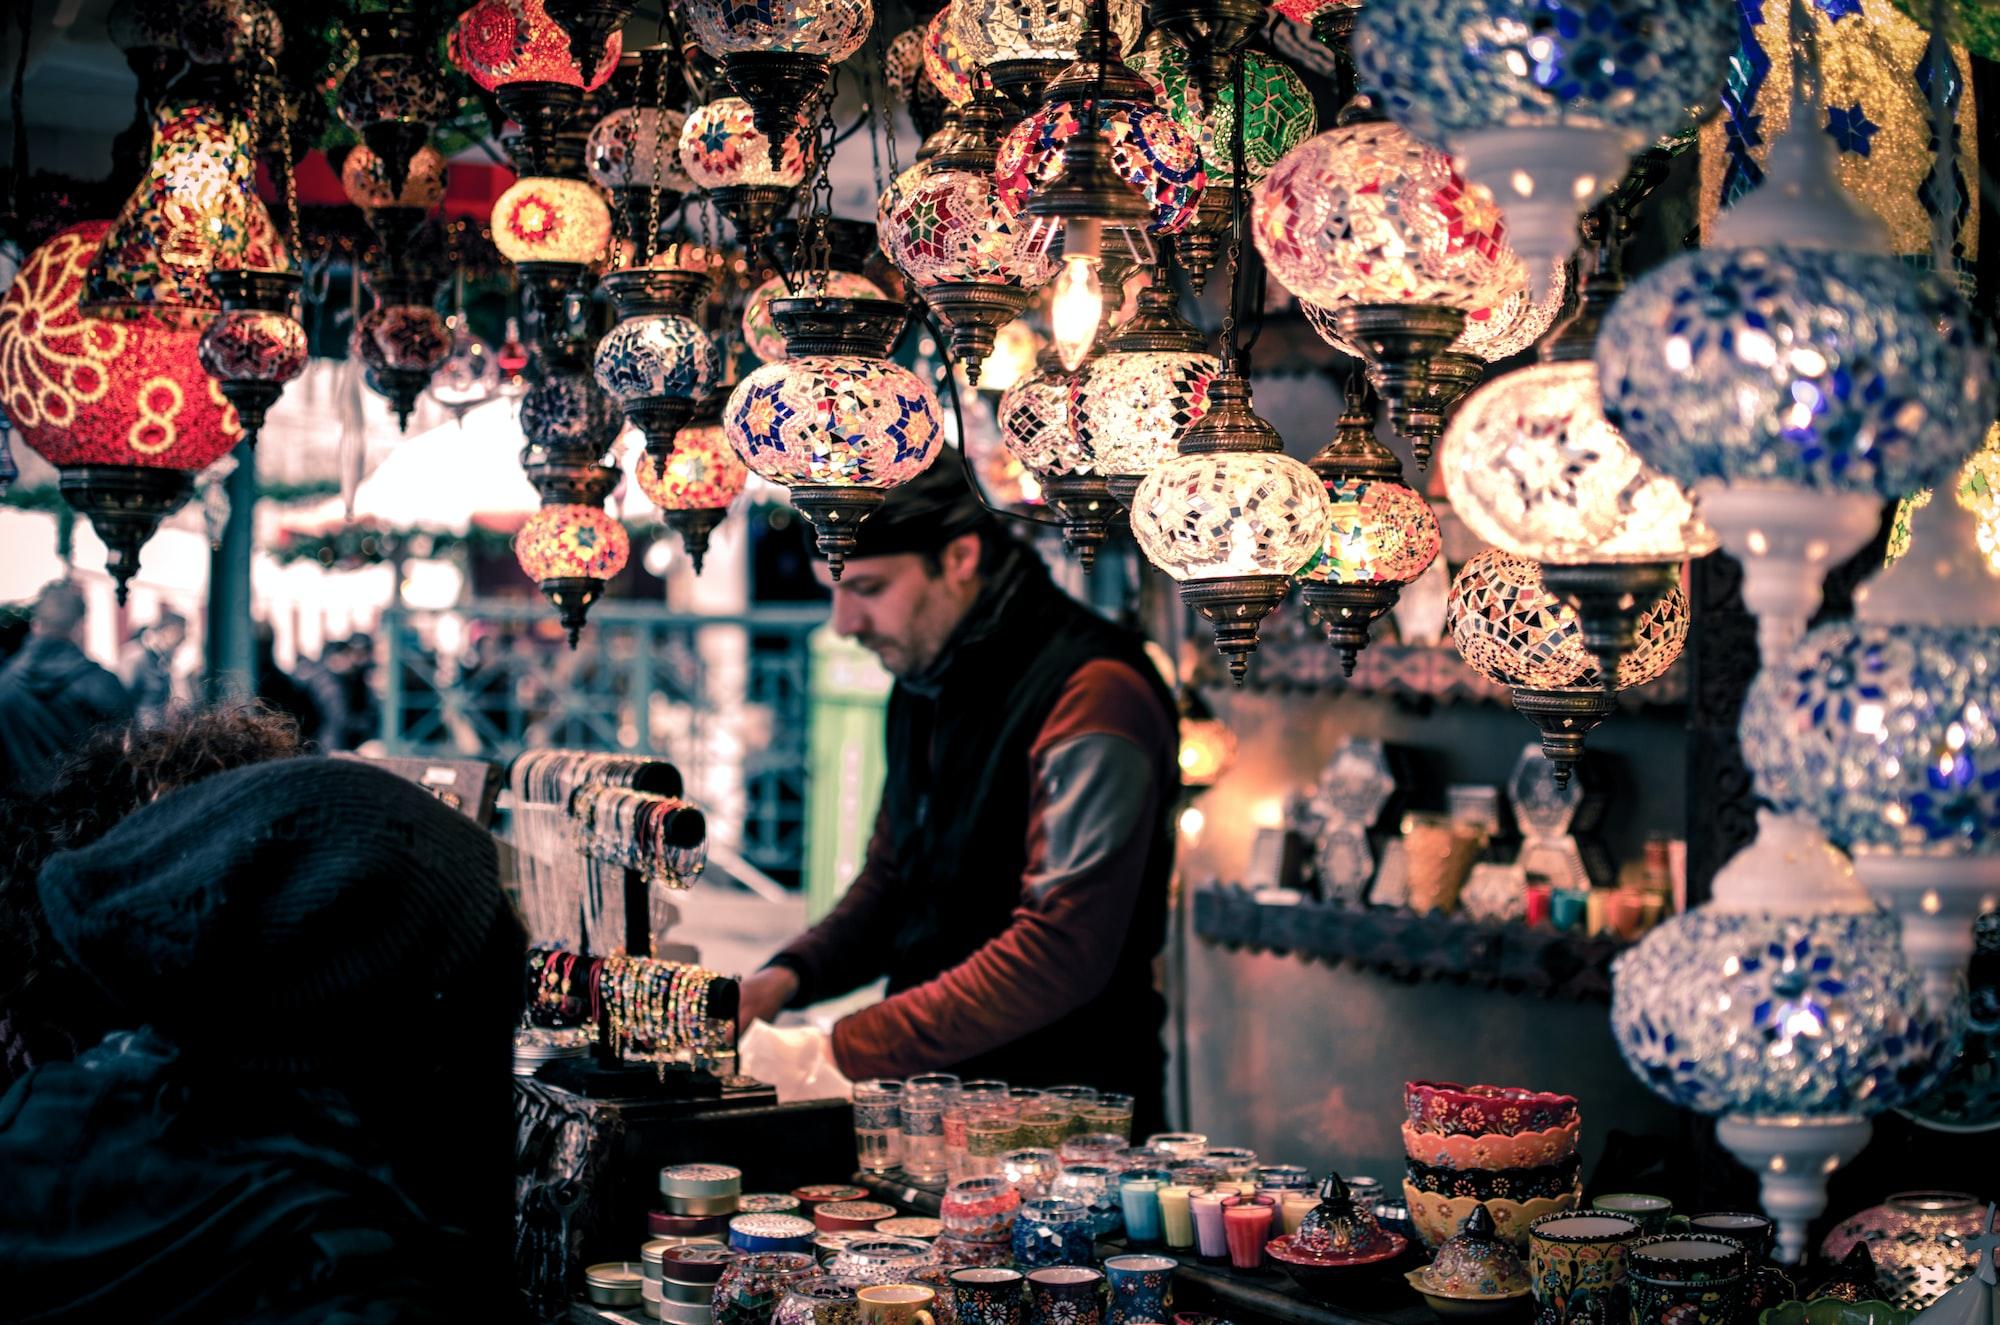 Lanterns at a bazaar